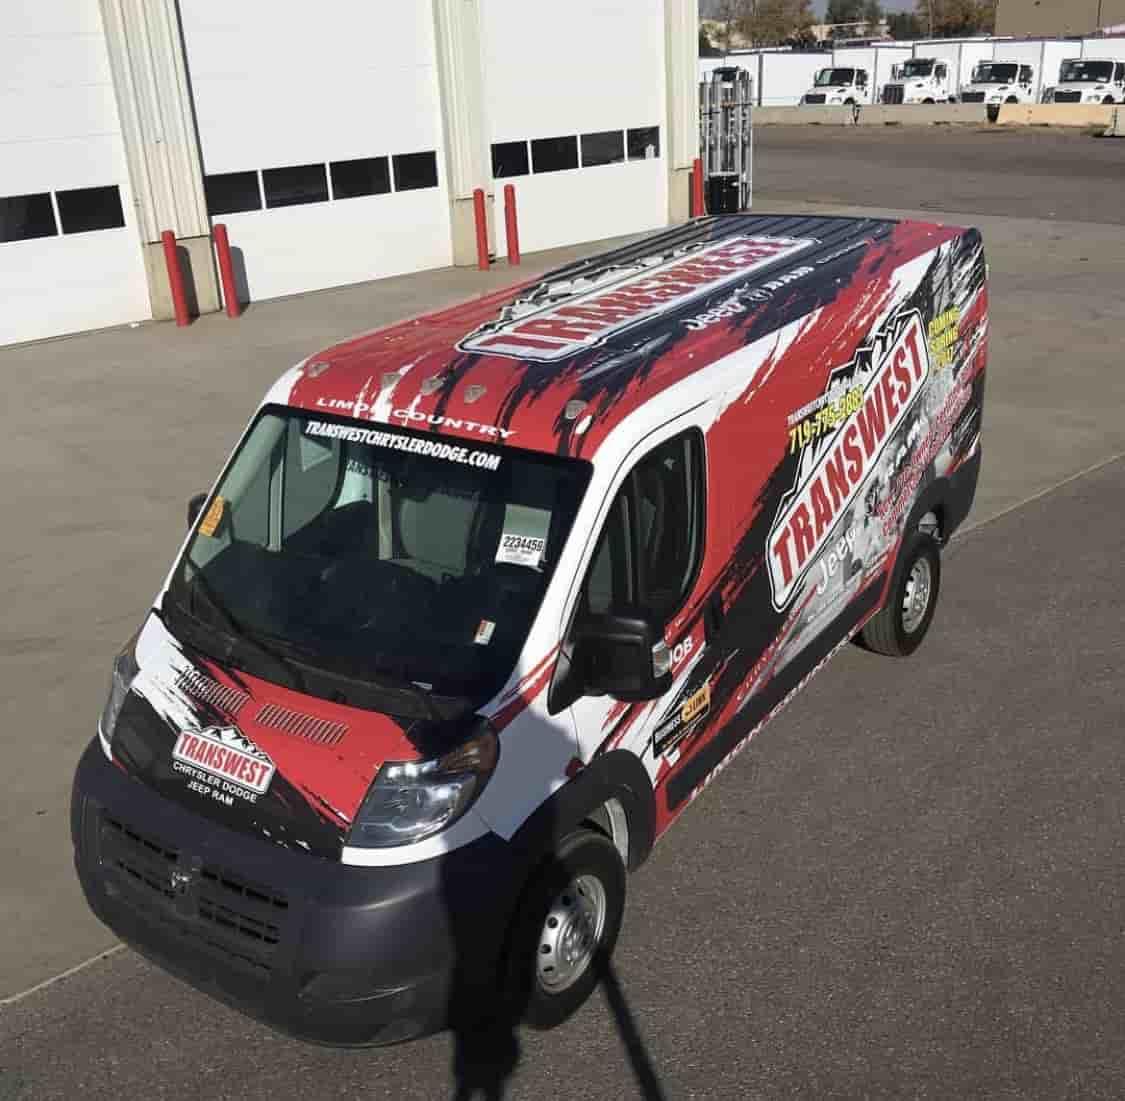 Vehicle graphics Denver - A3 Wraps of Denver, CO